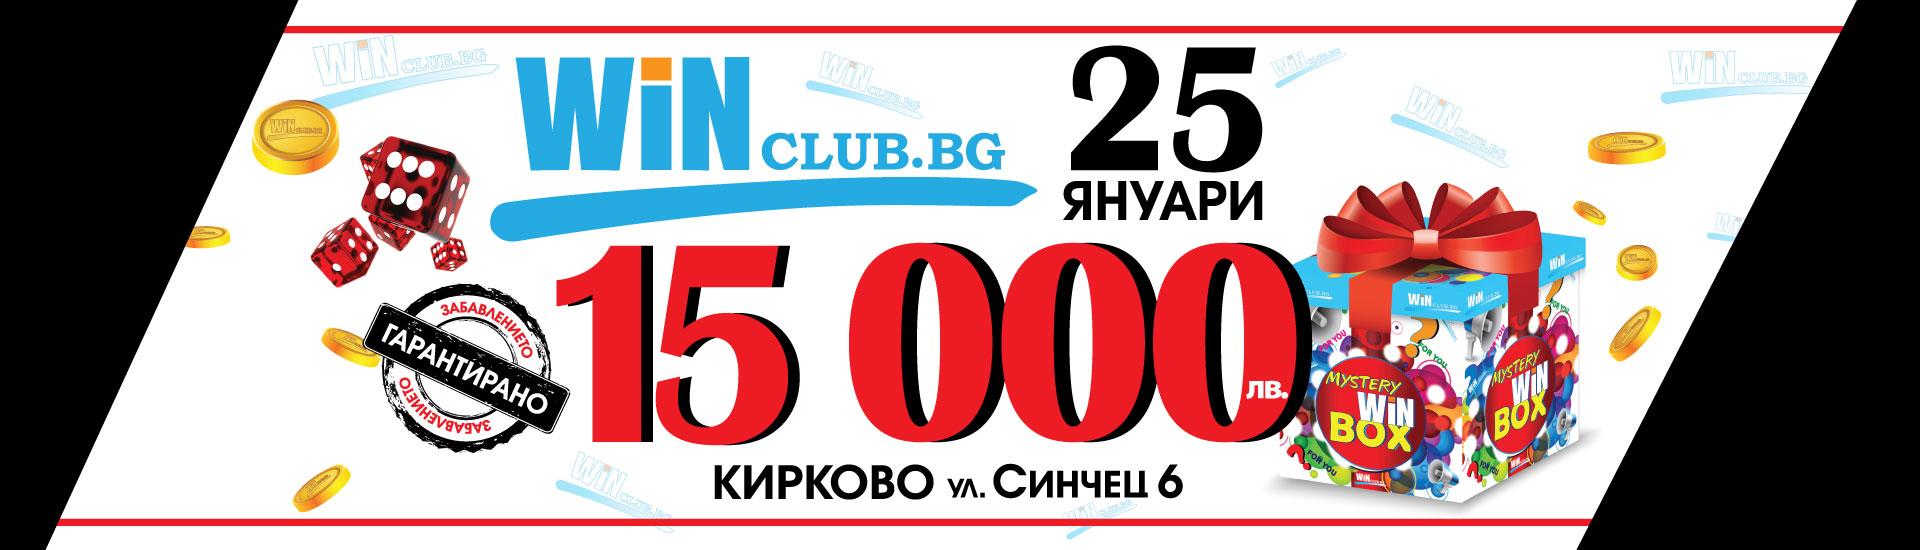 banners-Kirkovo